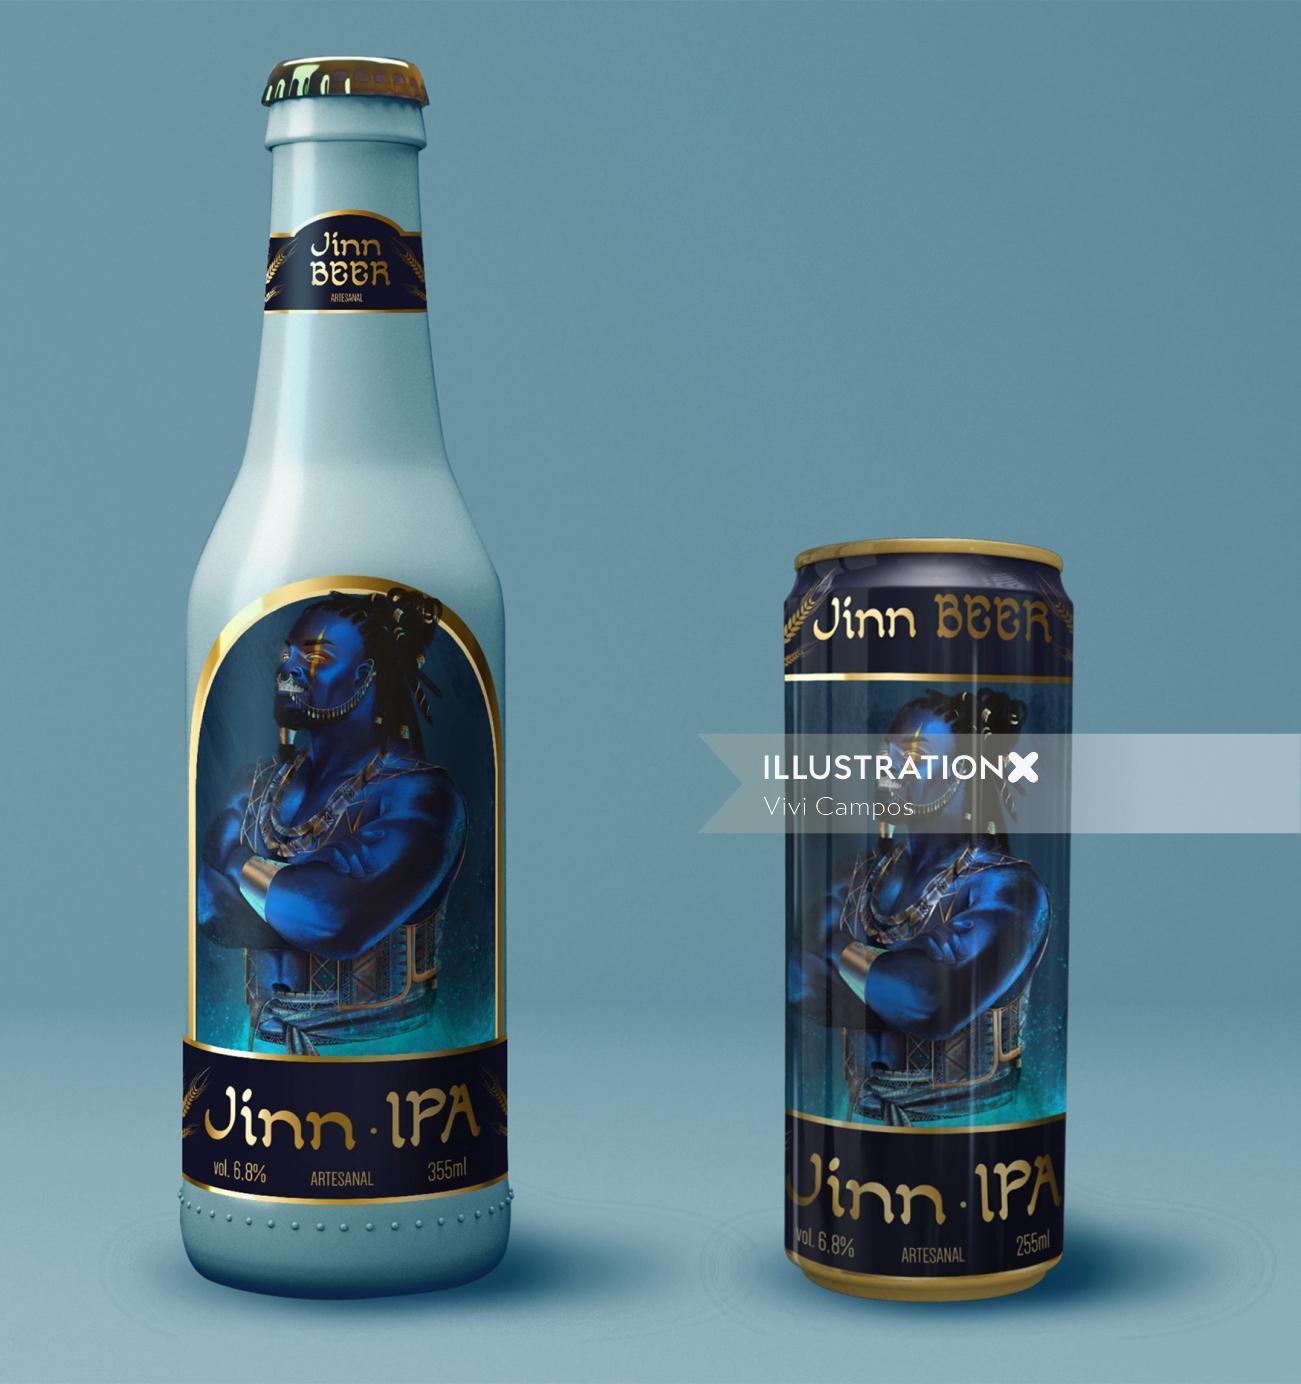 mythological character packaging illustration for beer brand